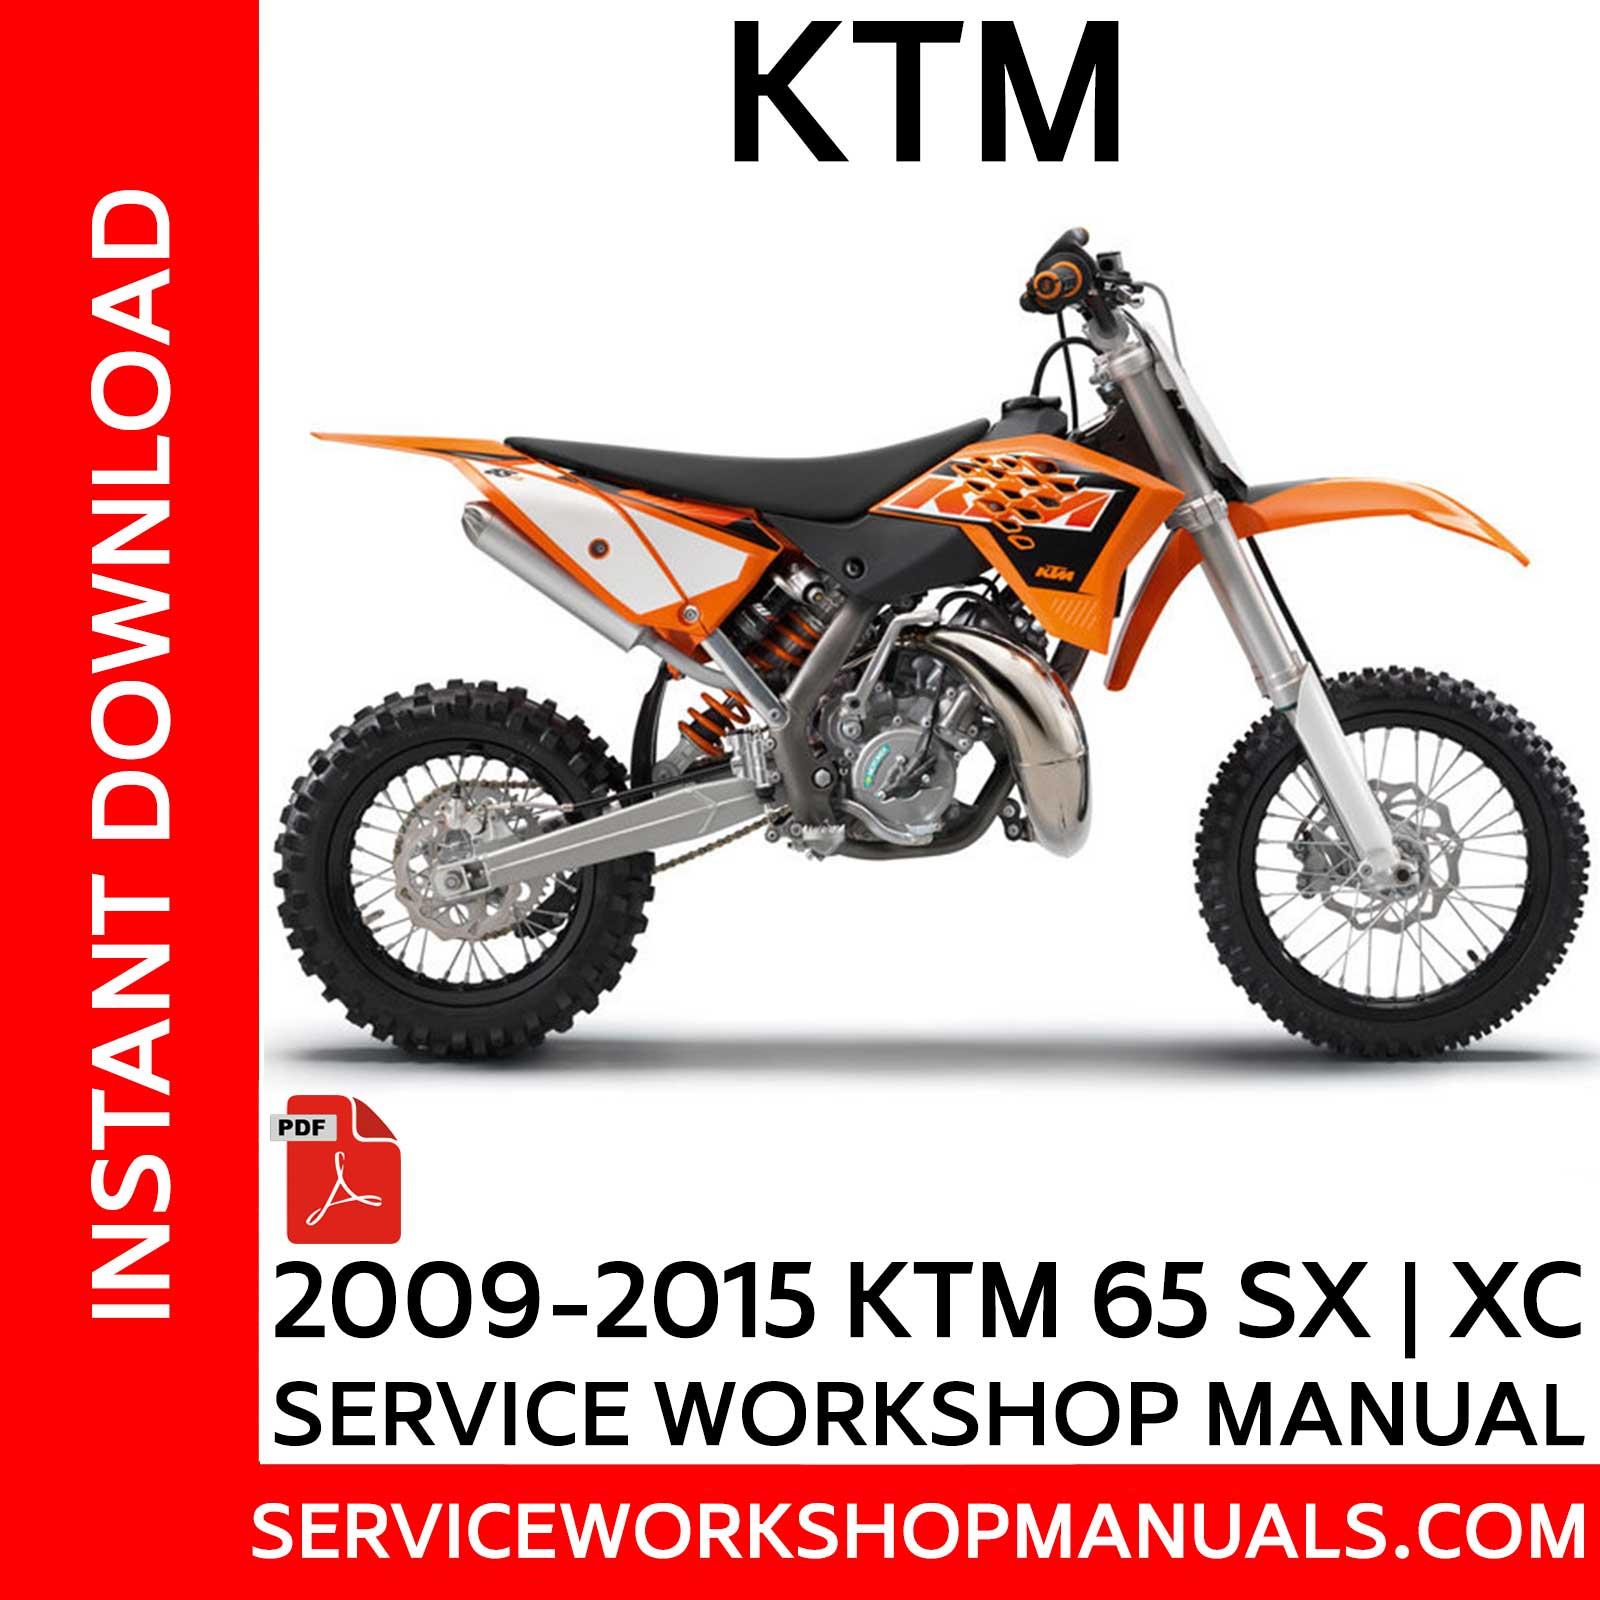 2009-2015 ktm 65 sx | xc service workshop manual - service workshop manuals  service workshop manuals